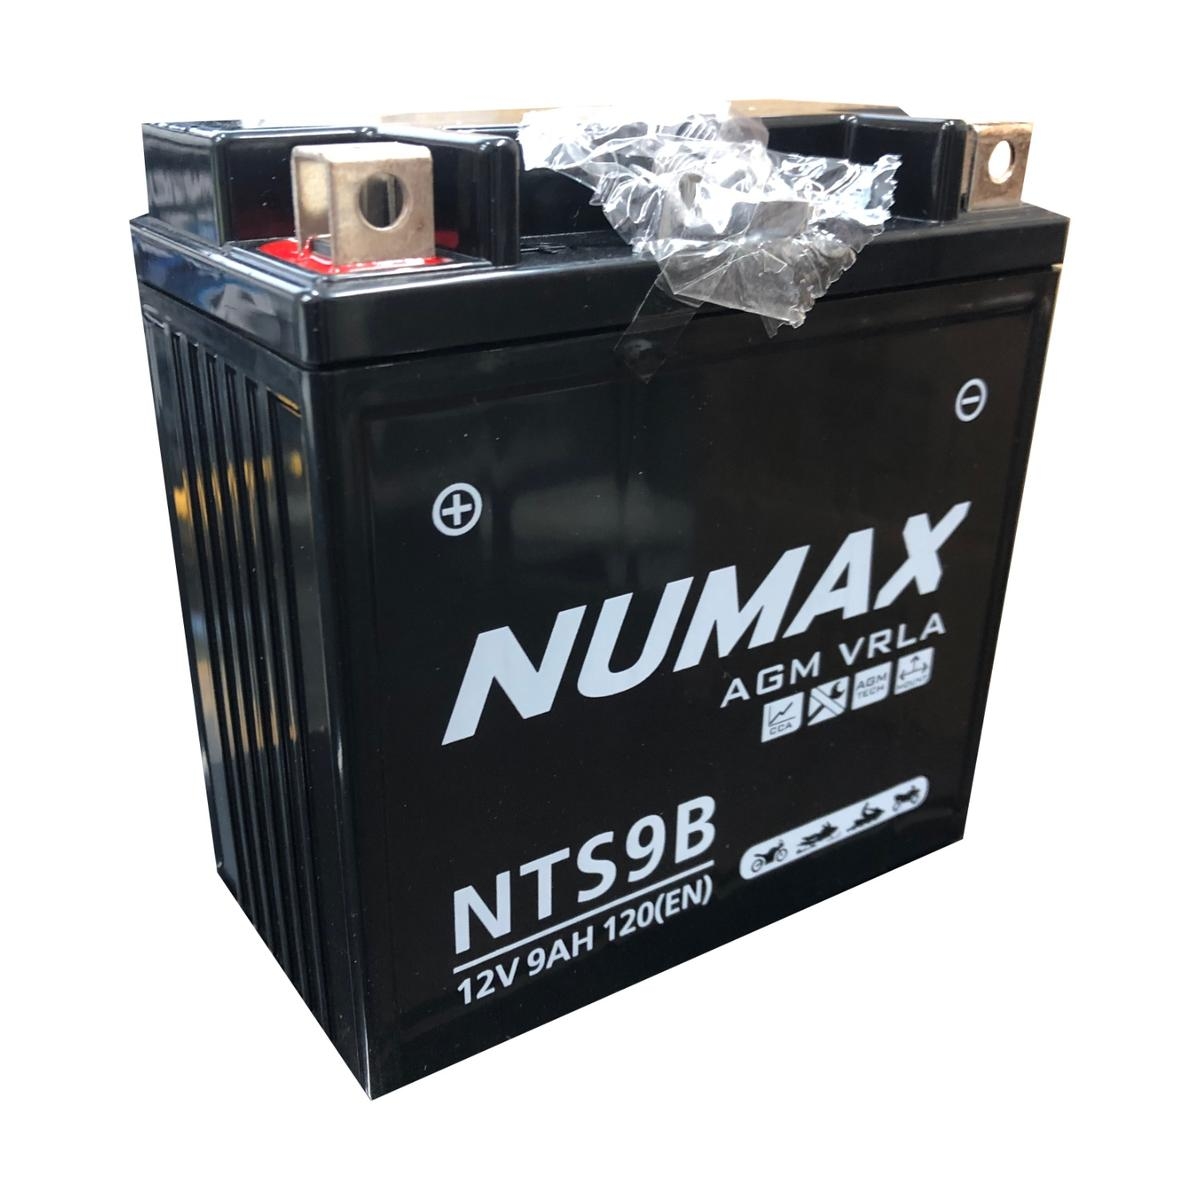 Numax NTS9B 12v Bike Motorbike Motorcycle Battery GILERA 250cc Arizona YB9L-B